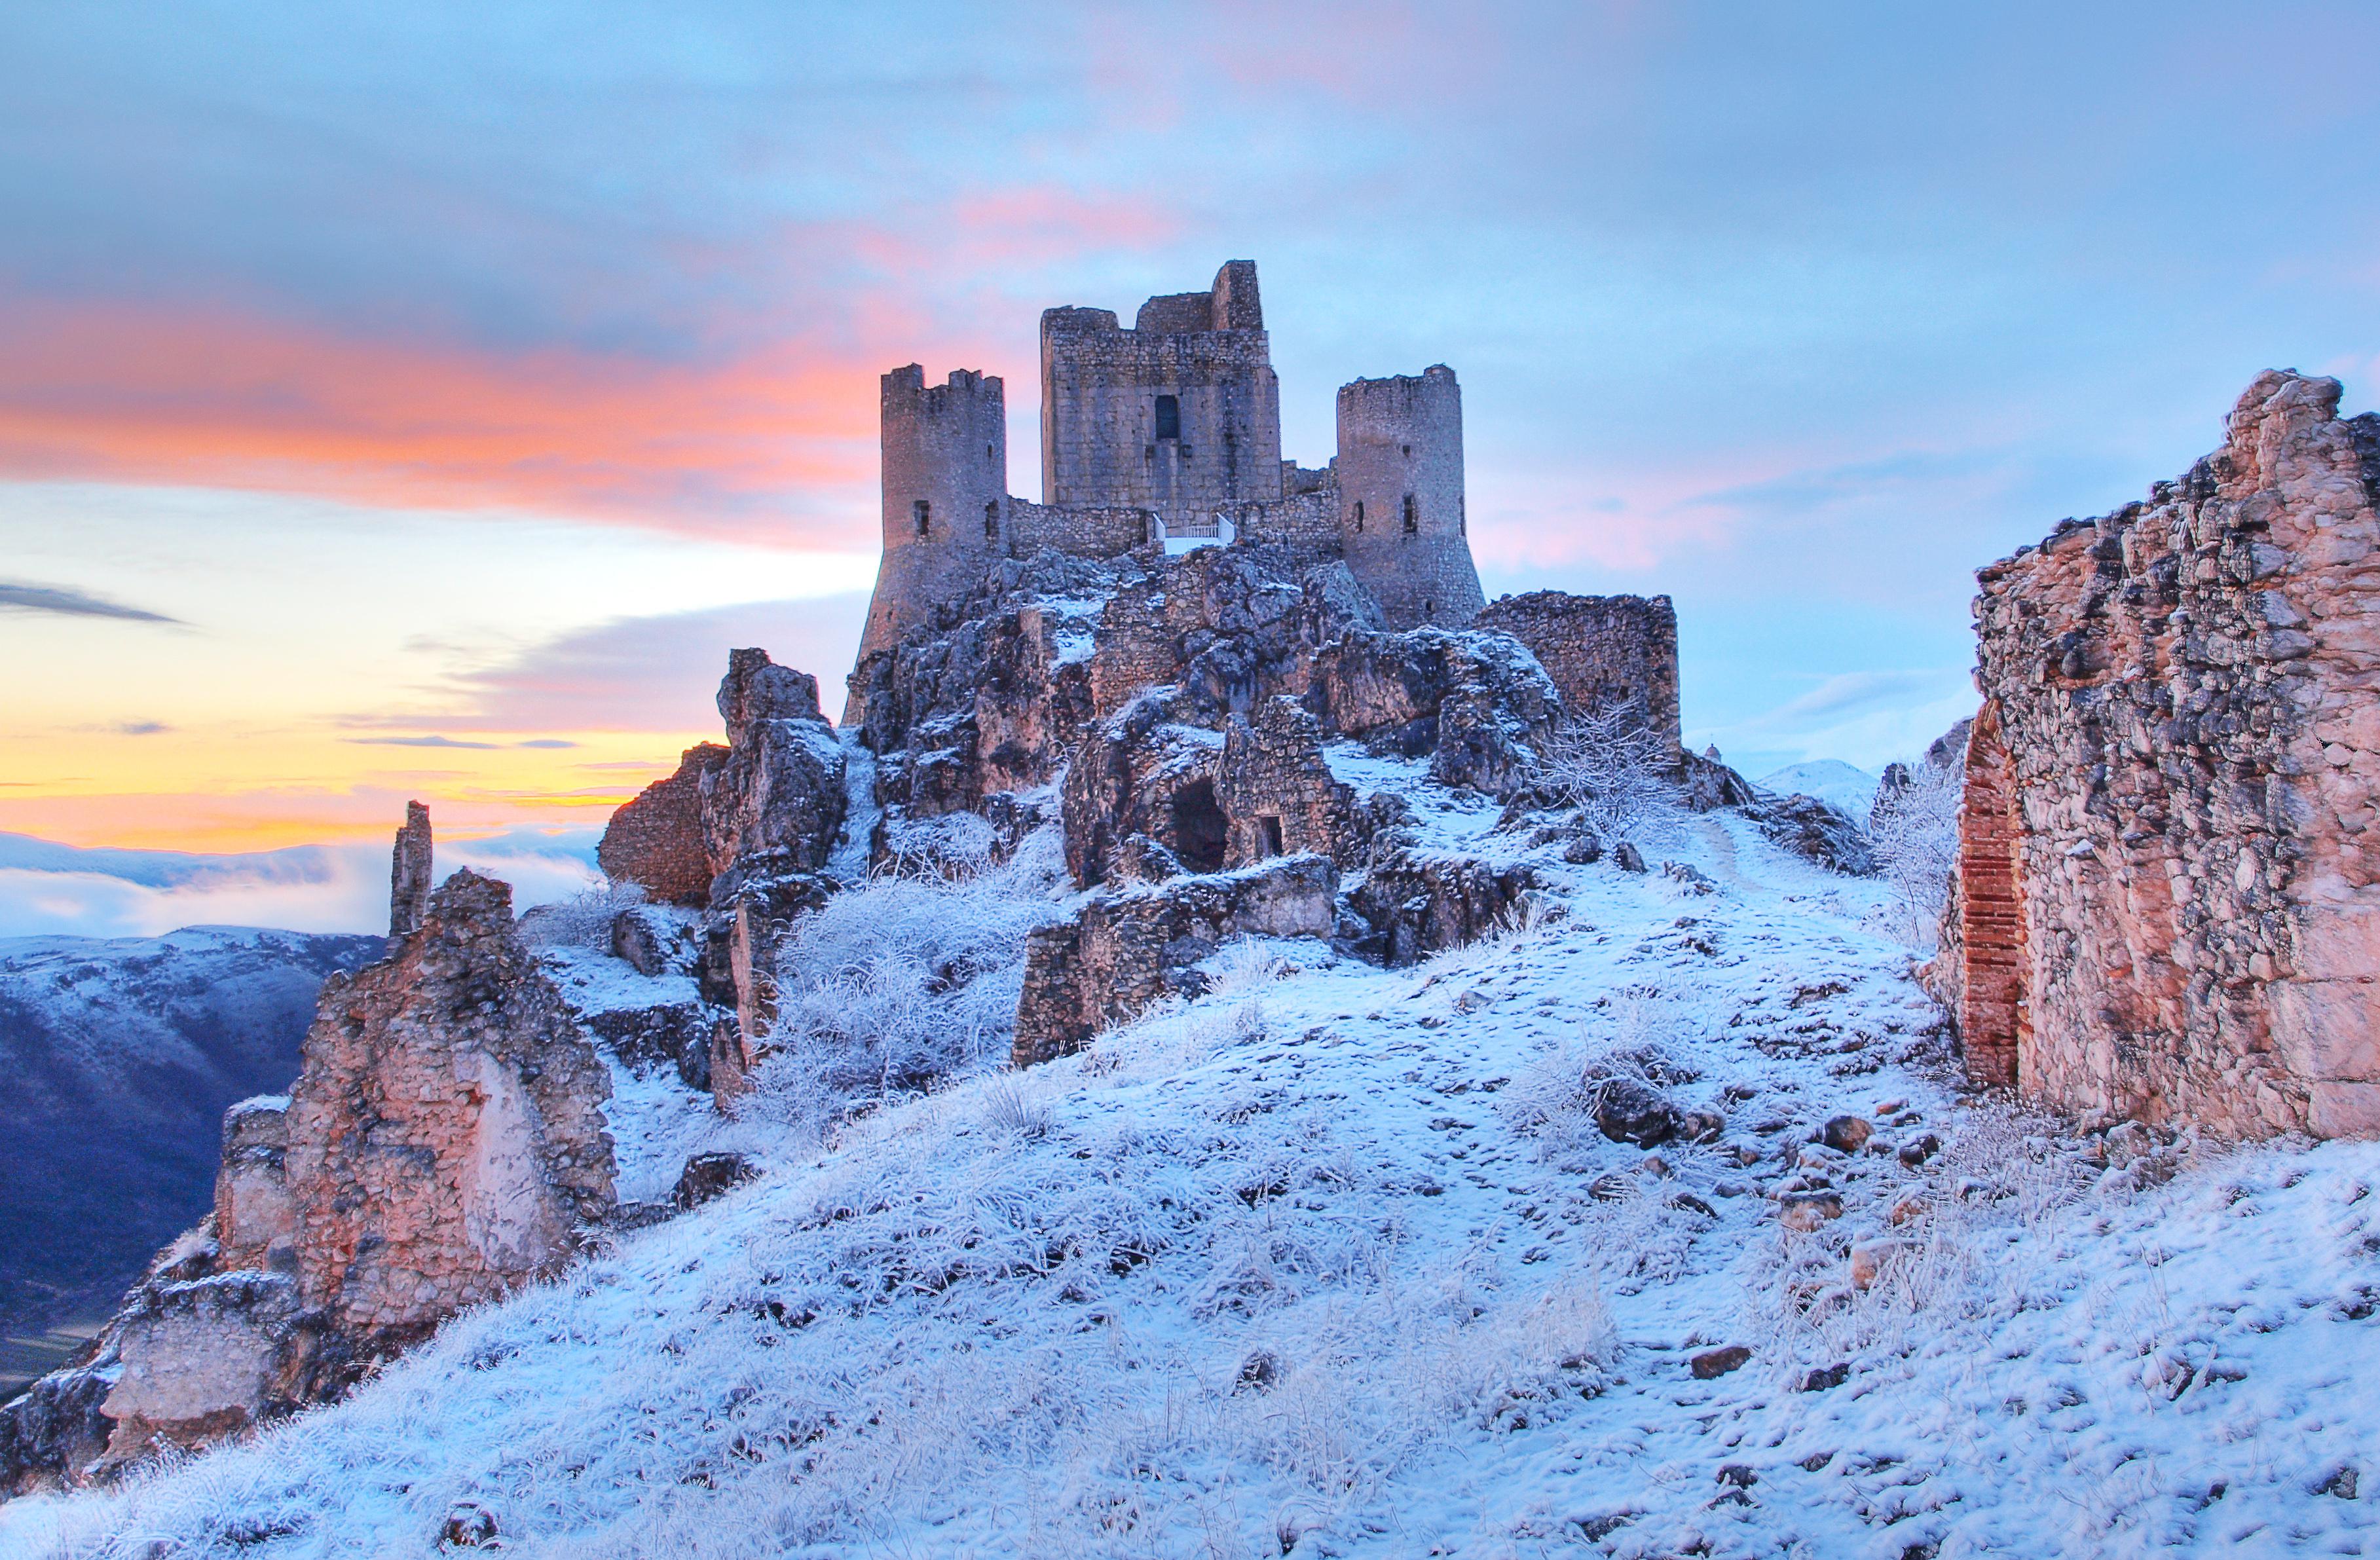 Castle Of Rocca Calascio In Italy 3634x2382 Os Castles